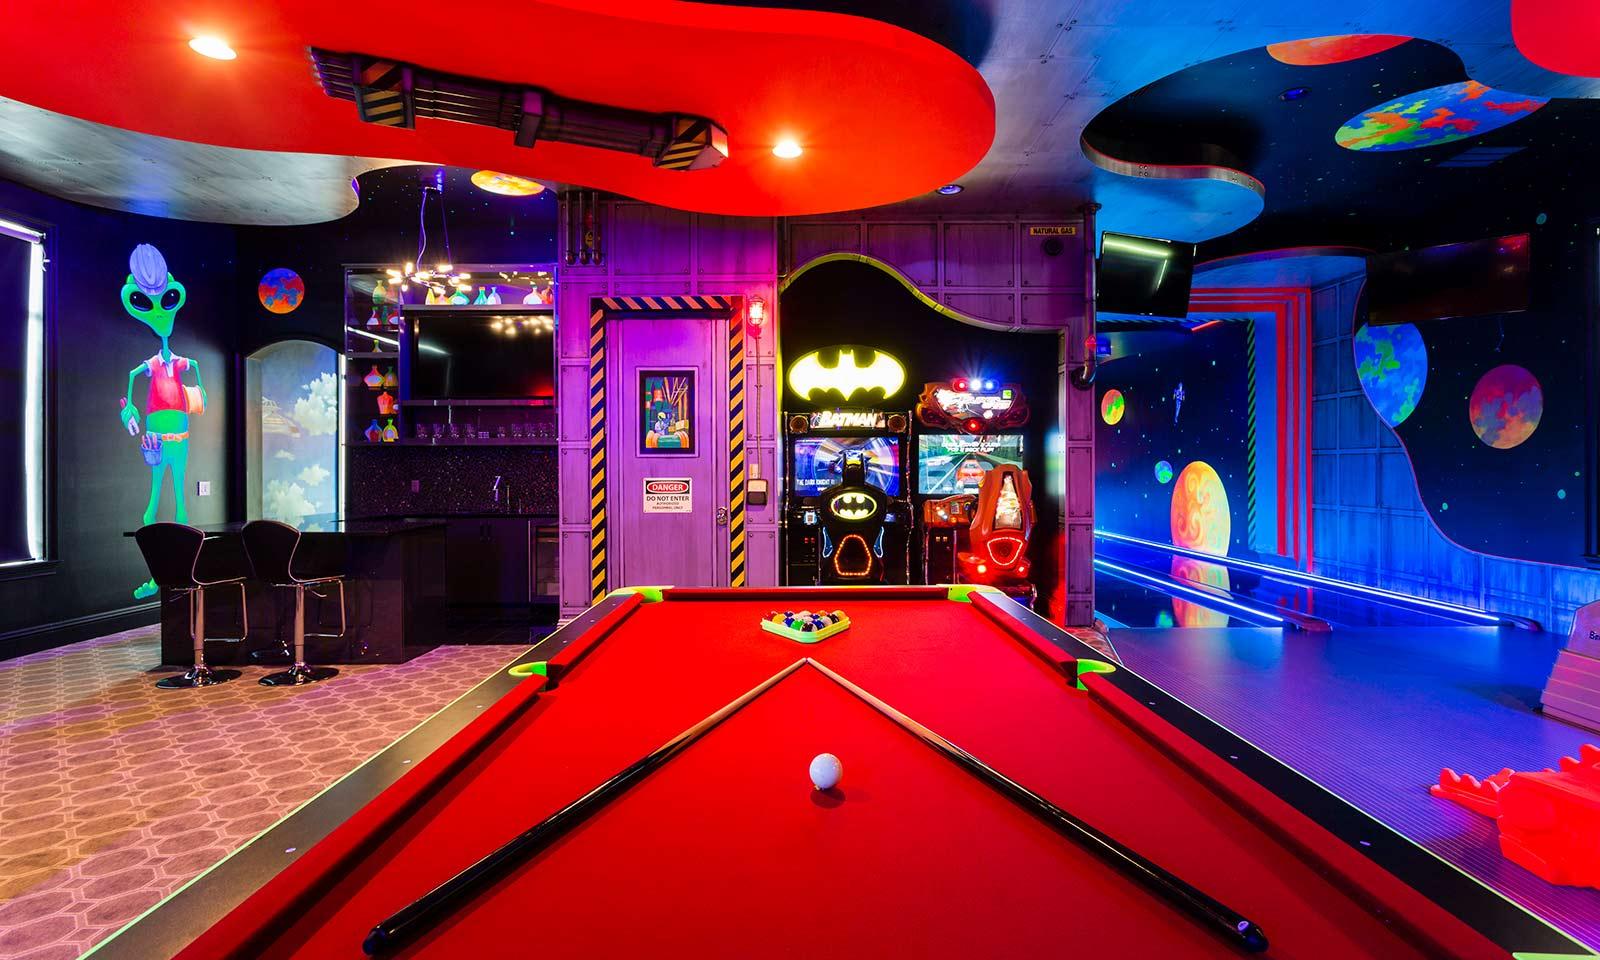 [amenities:Arcade-Bowling-Alley:2] Arcade Bowling Alley